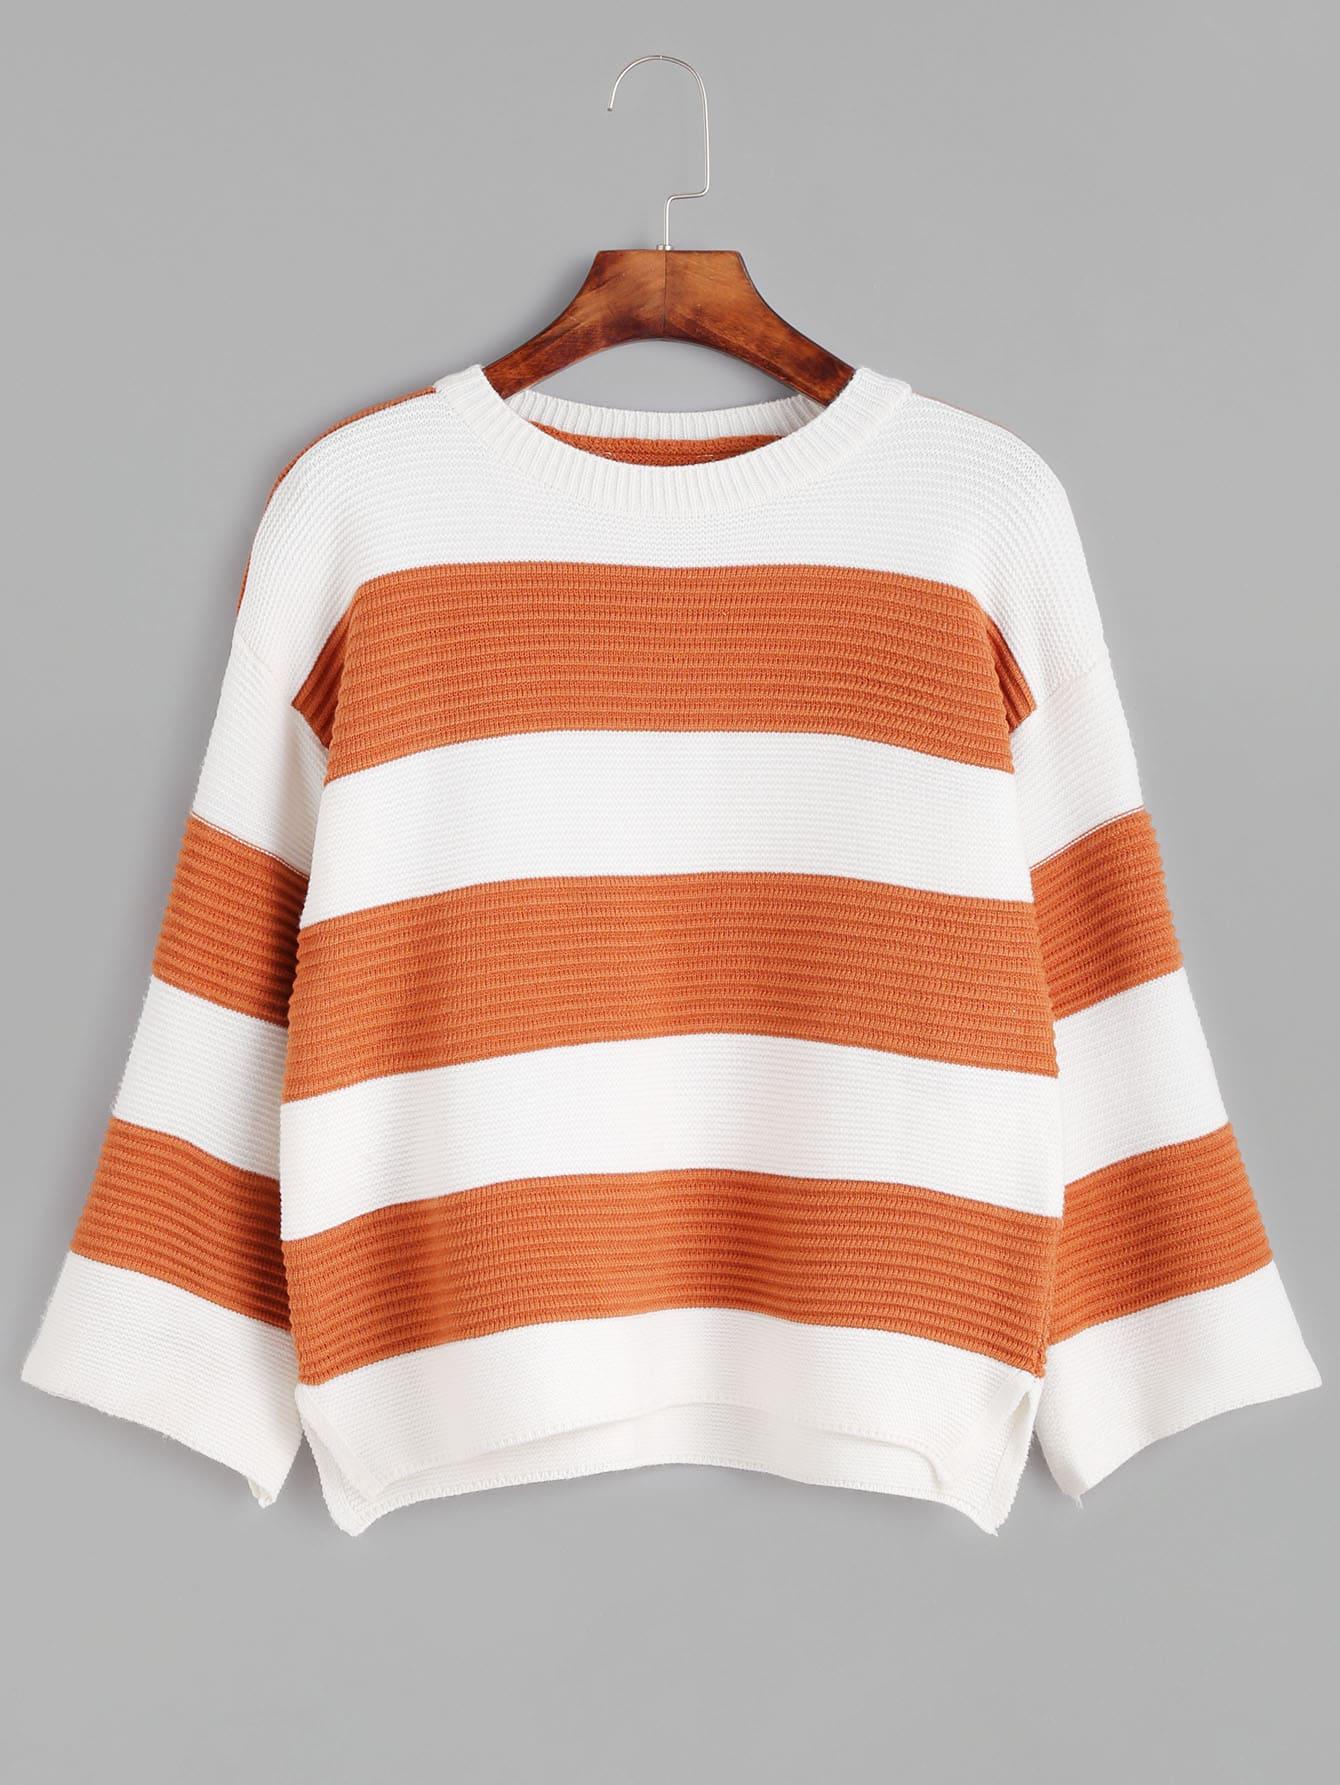 Wide Striped Dropped Shoulder Seam Sweater RKNI161007105